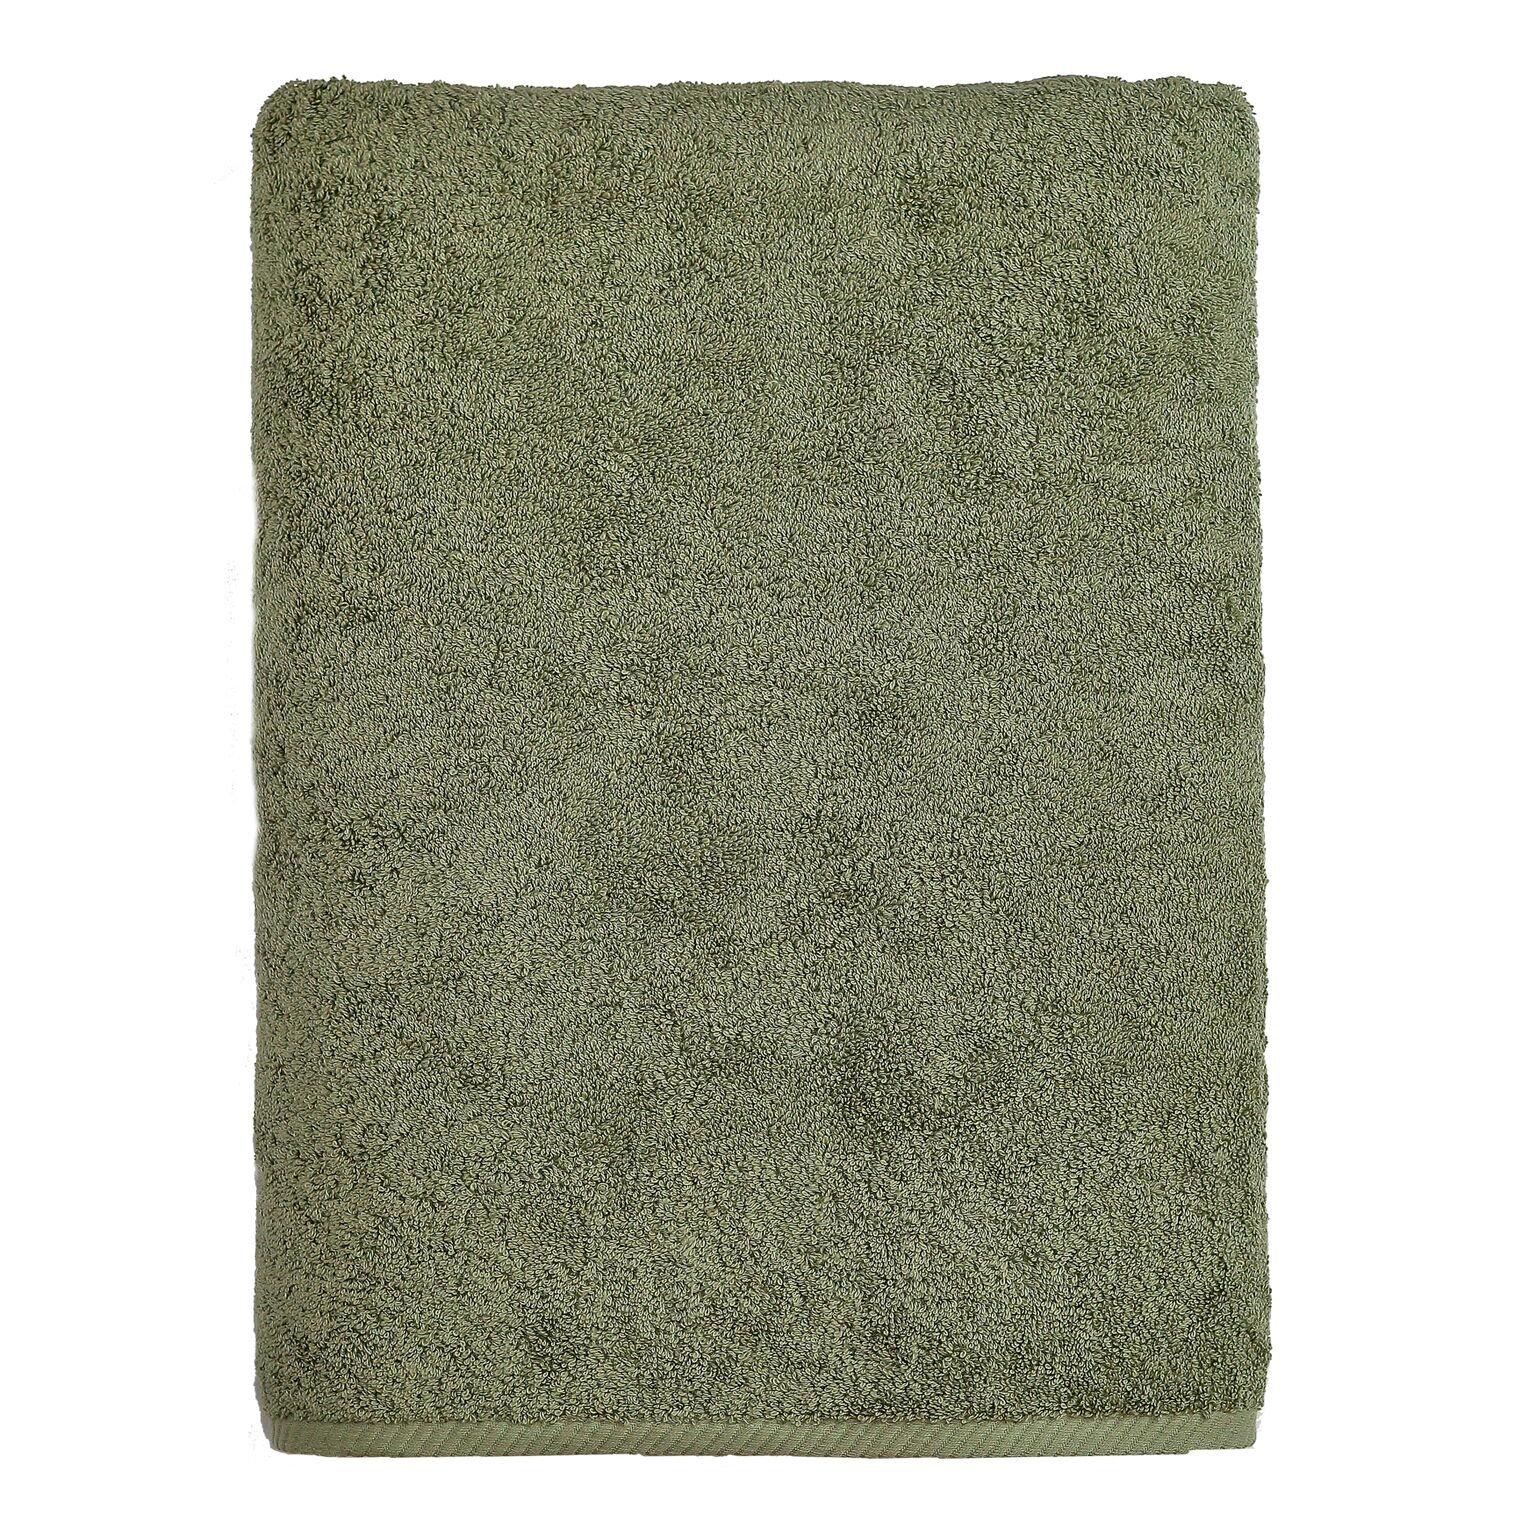 Linum Home Textiles Soft Twist Premium Authentic Soft 100% Turkish Cotton Luxury Hotel Collection Bath Sheet, Light Olive